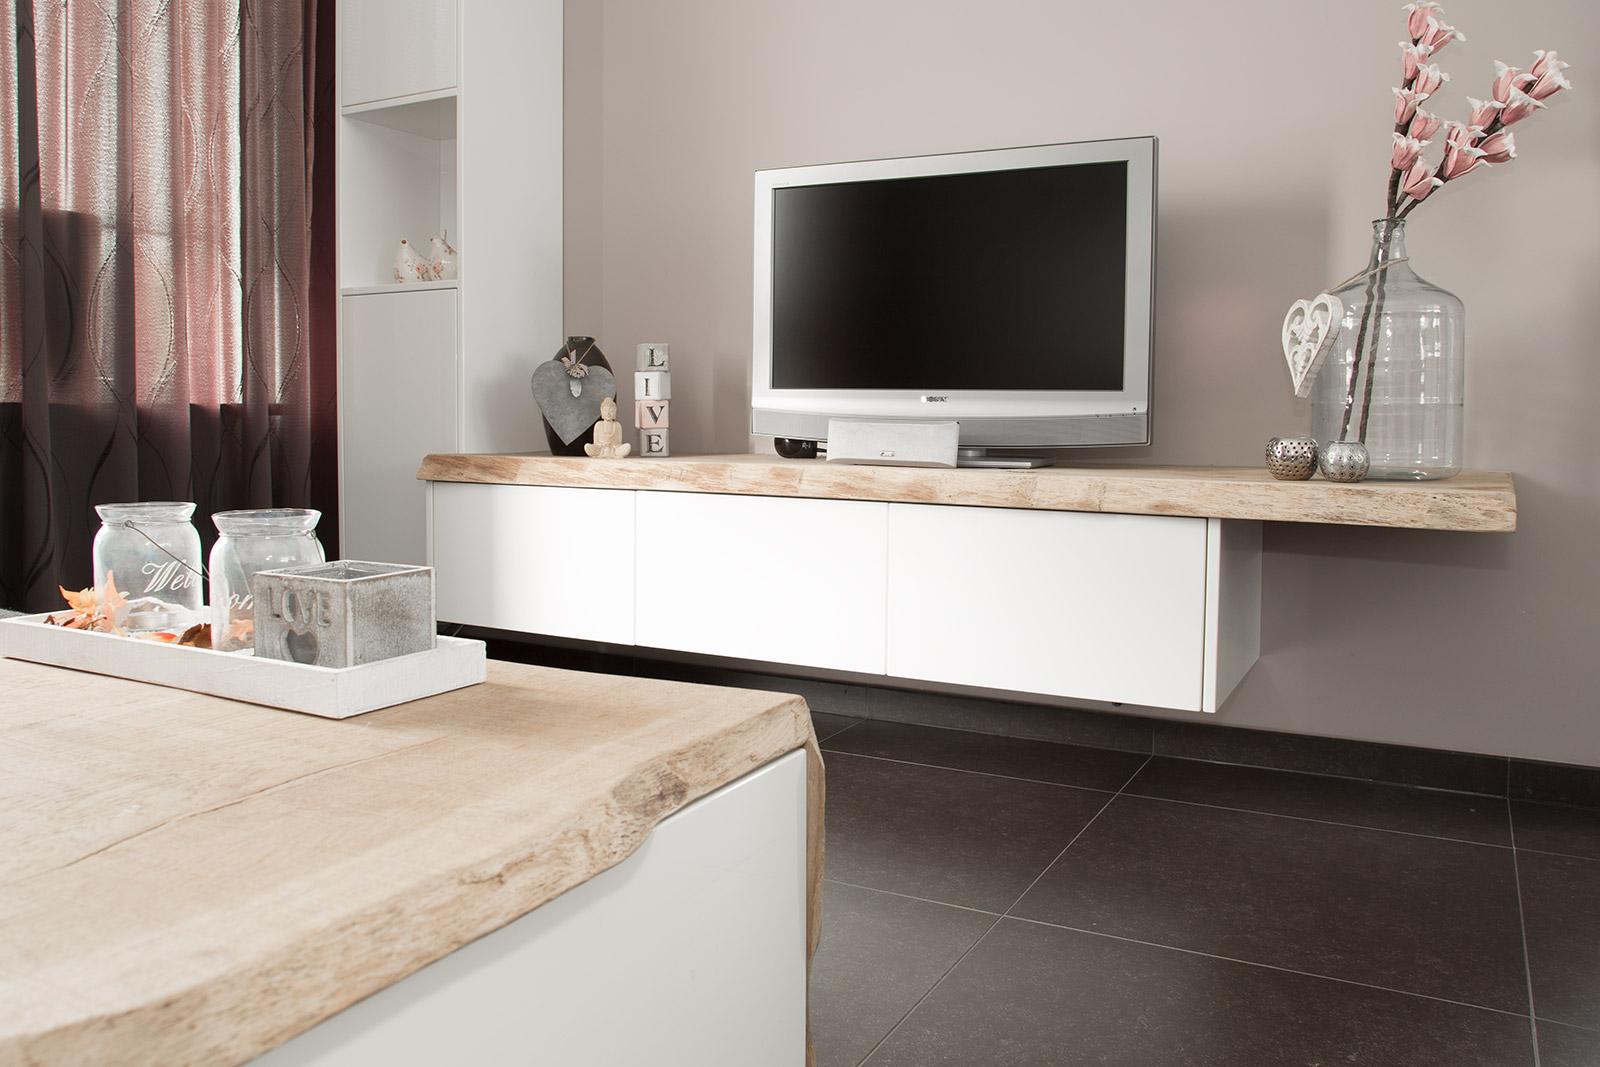 Design Woonkamer Kast : ... salontafel - CVH Design - Maatinterieur ...